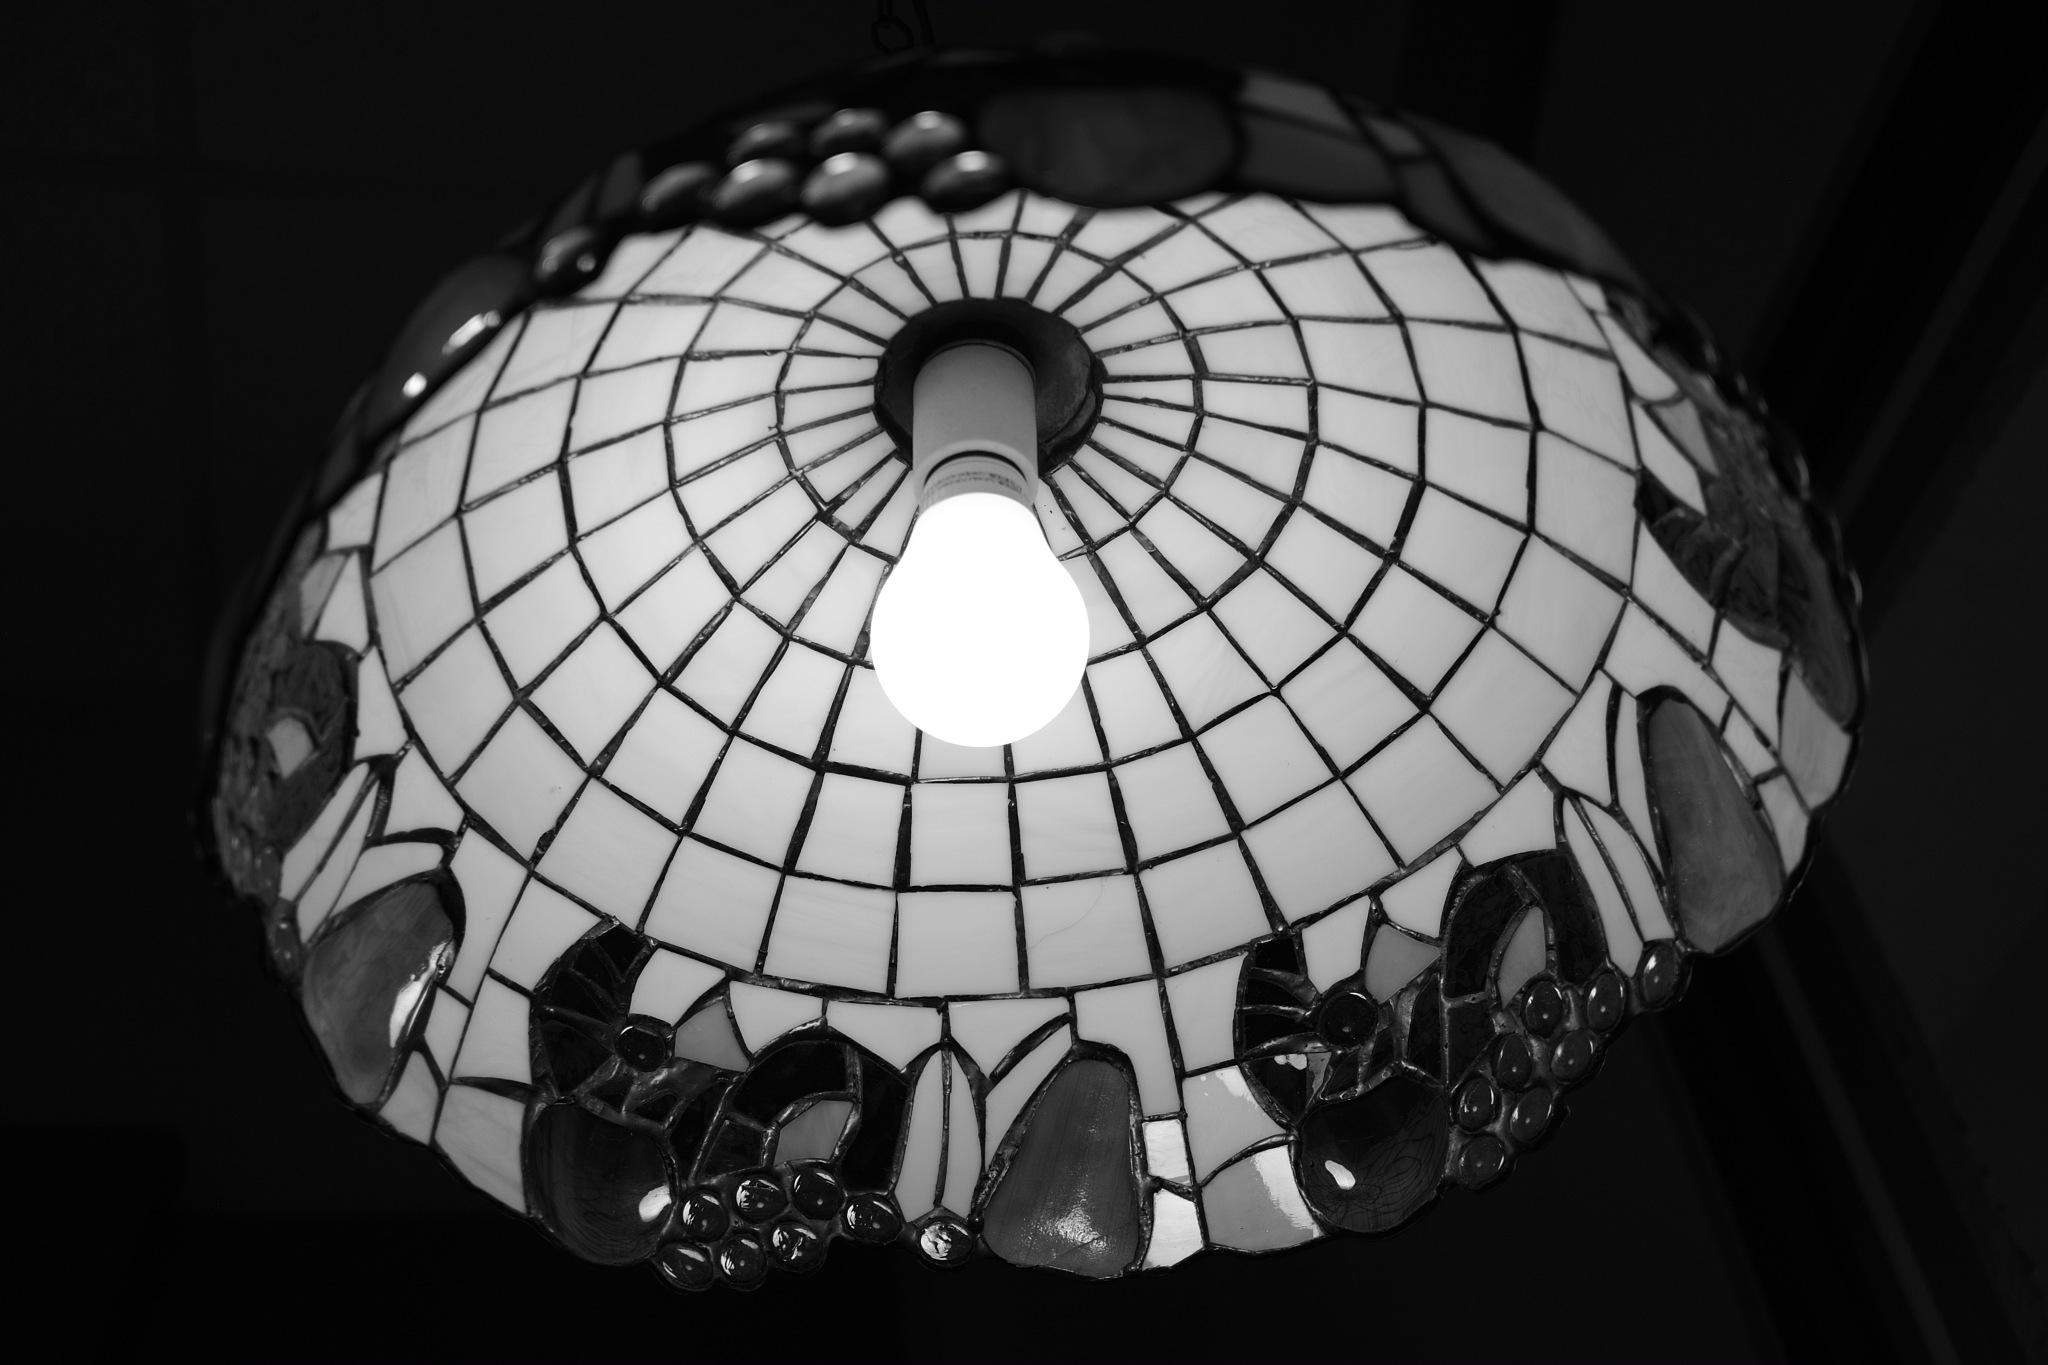 Light Fixture by James F Keck